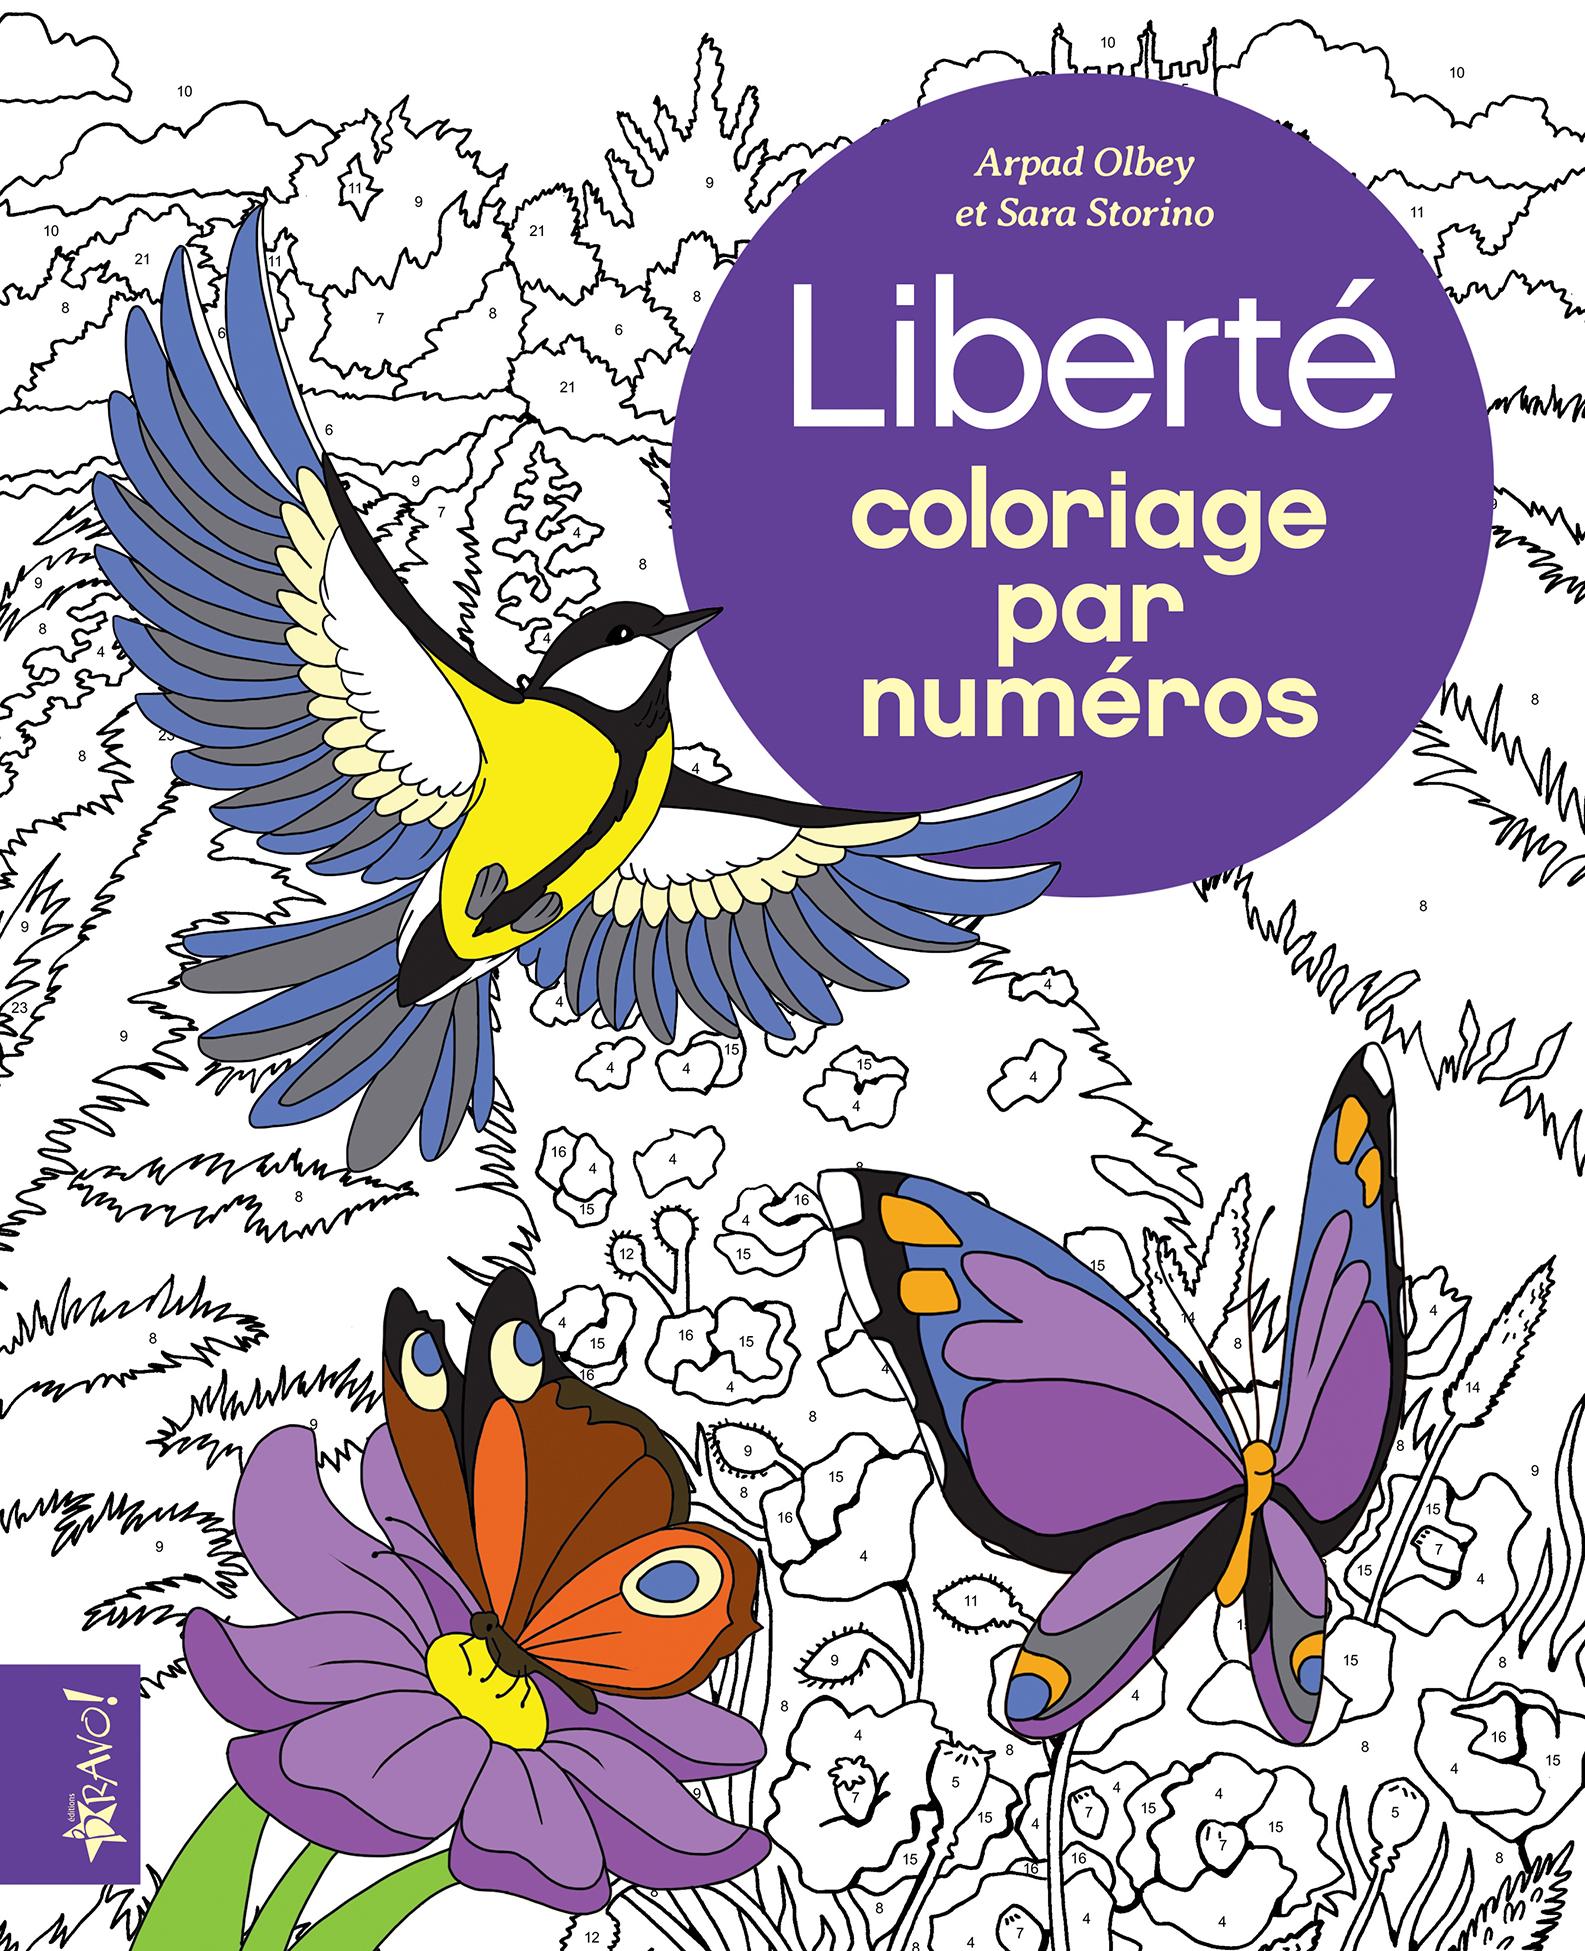 353_ColoriageParNumeros_Liberté_C1